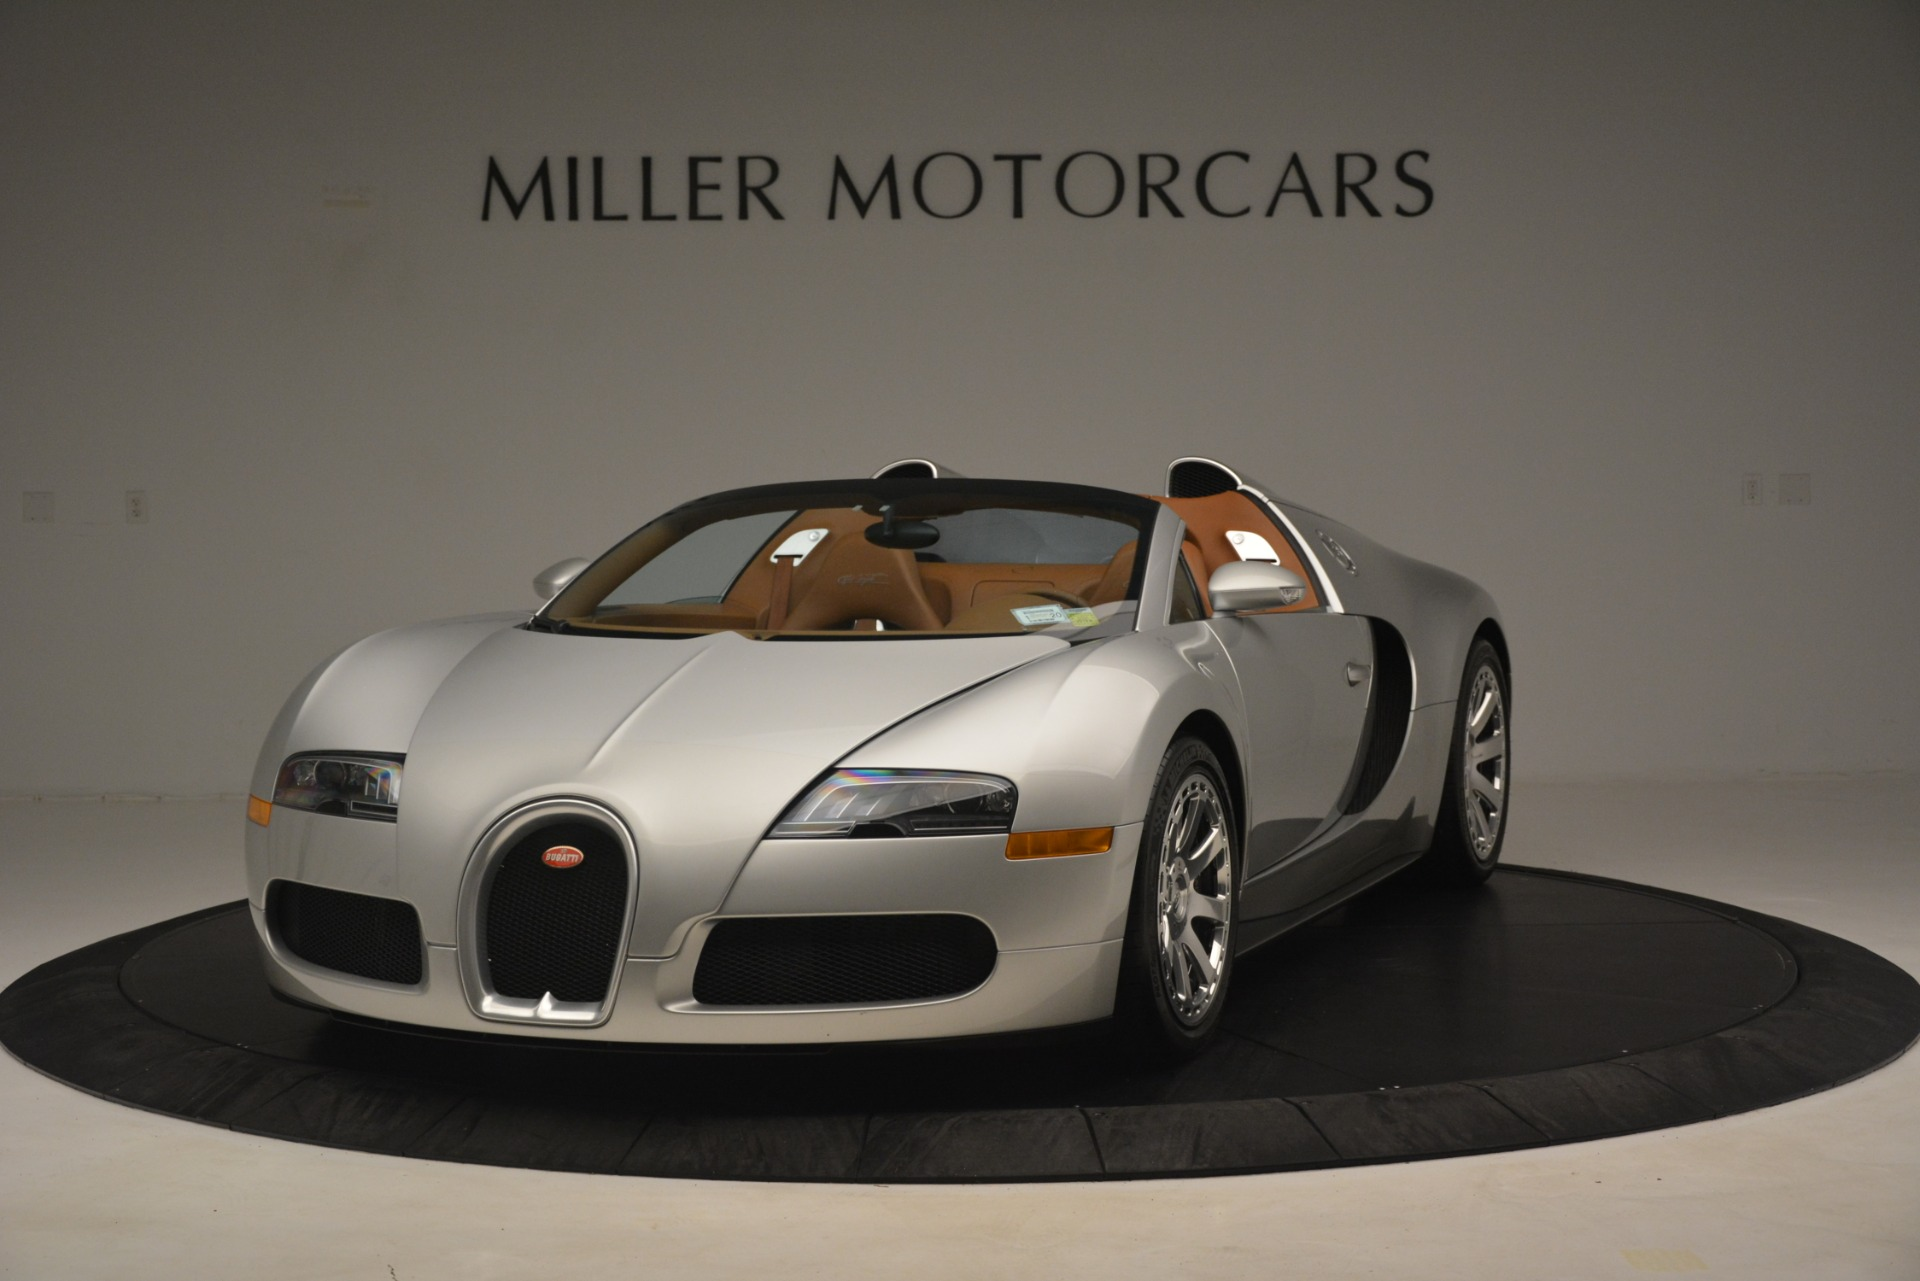 Used 2010 Bugatti Veyron 16.4 Grand Sport For Sale In Greenwich, CT 3159_main